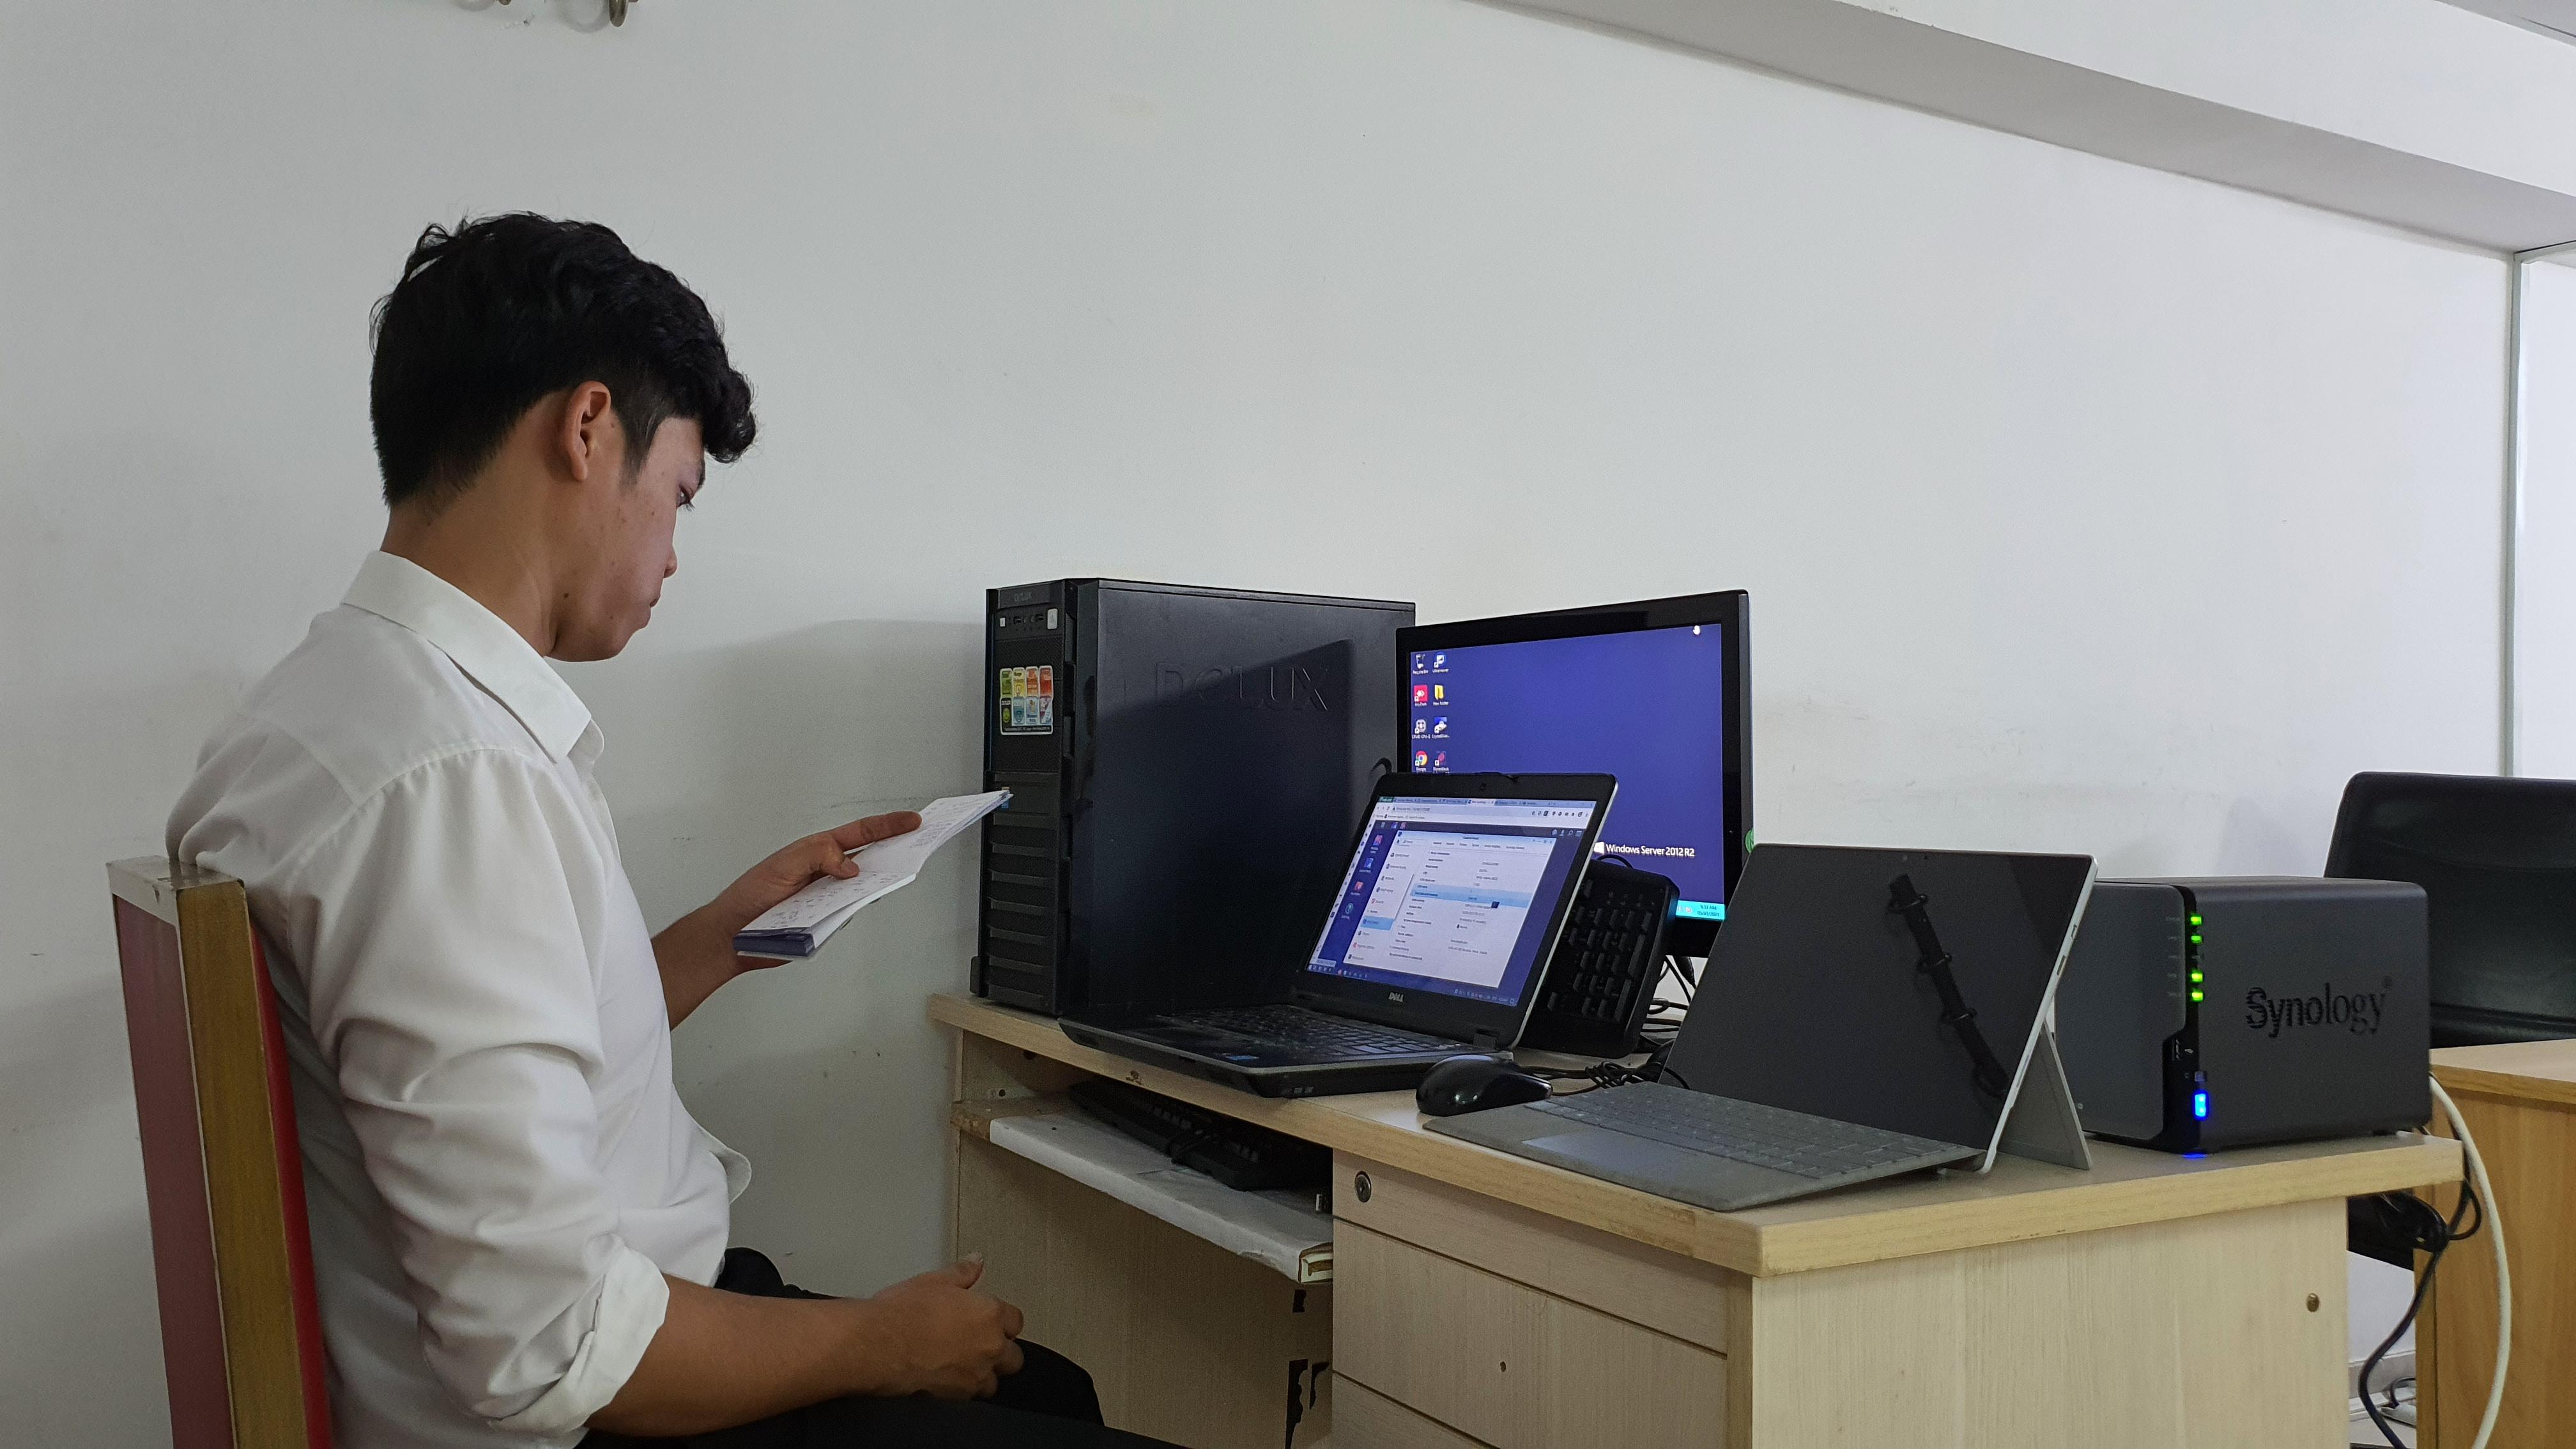 cung-synology-voi-thay-doi-nho-cho-buoc-tien-lon-02